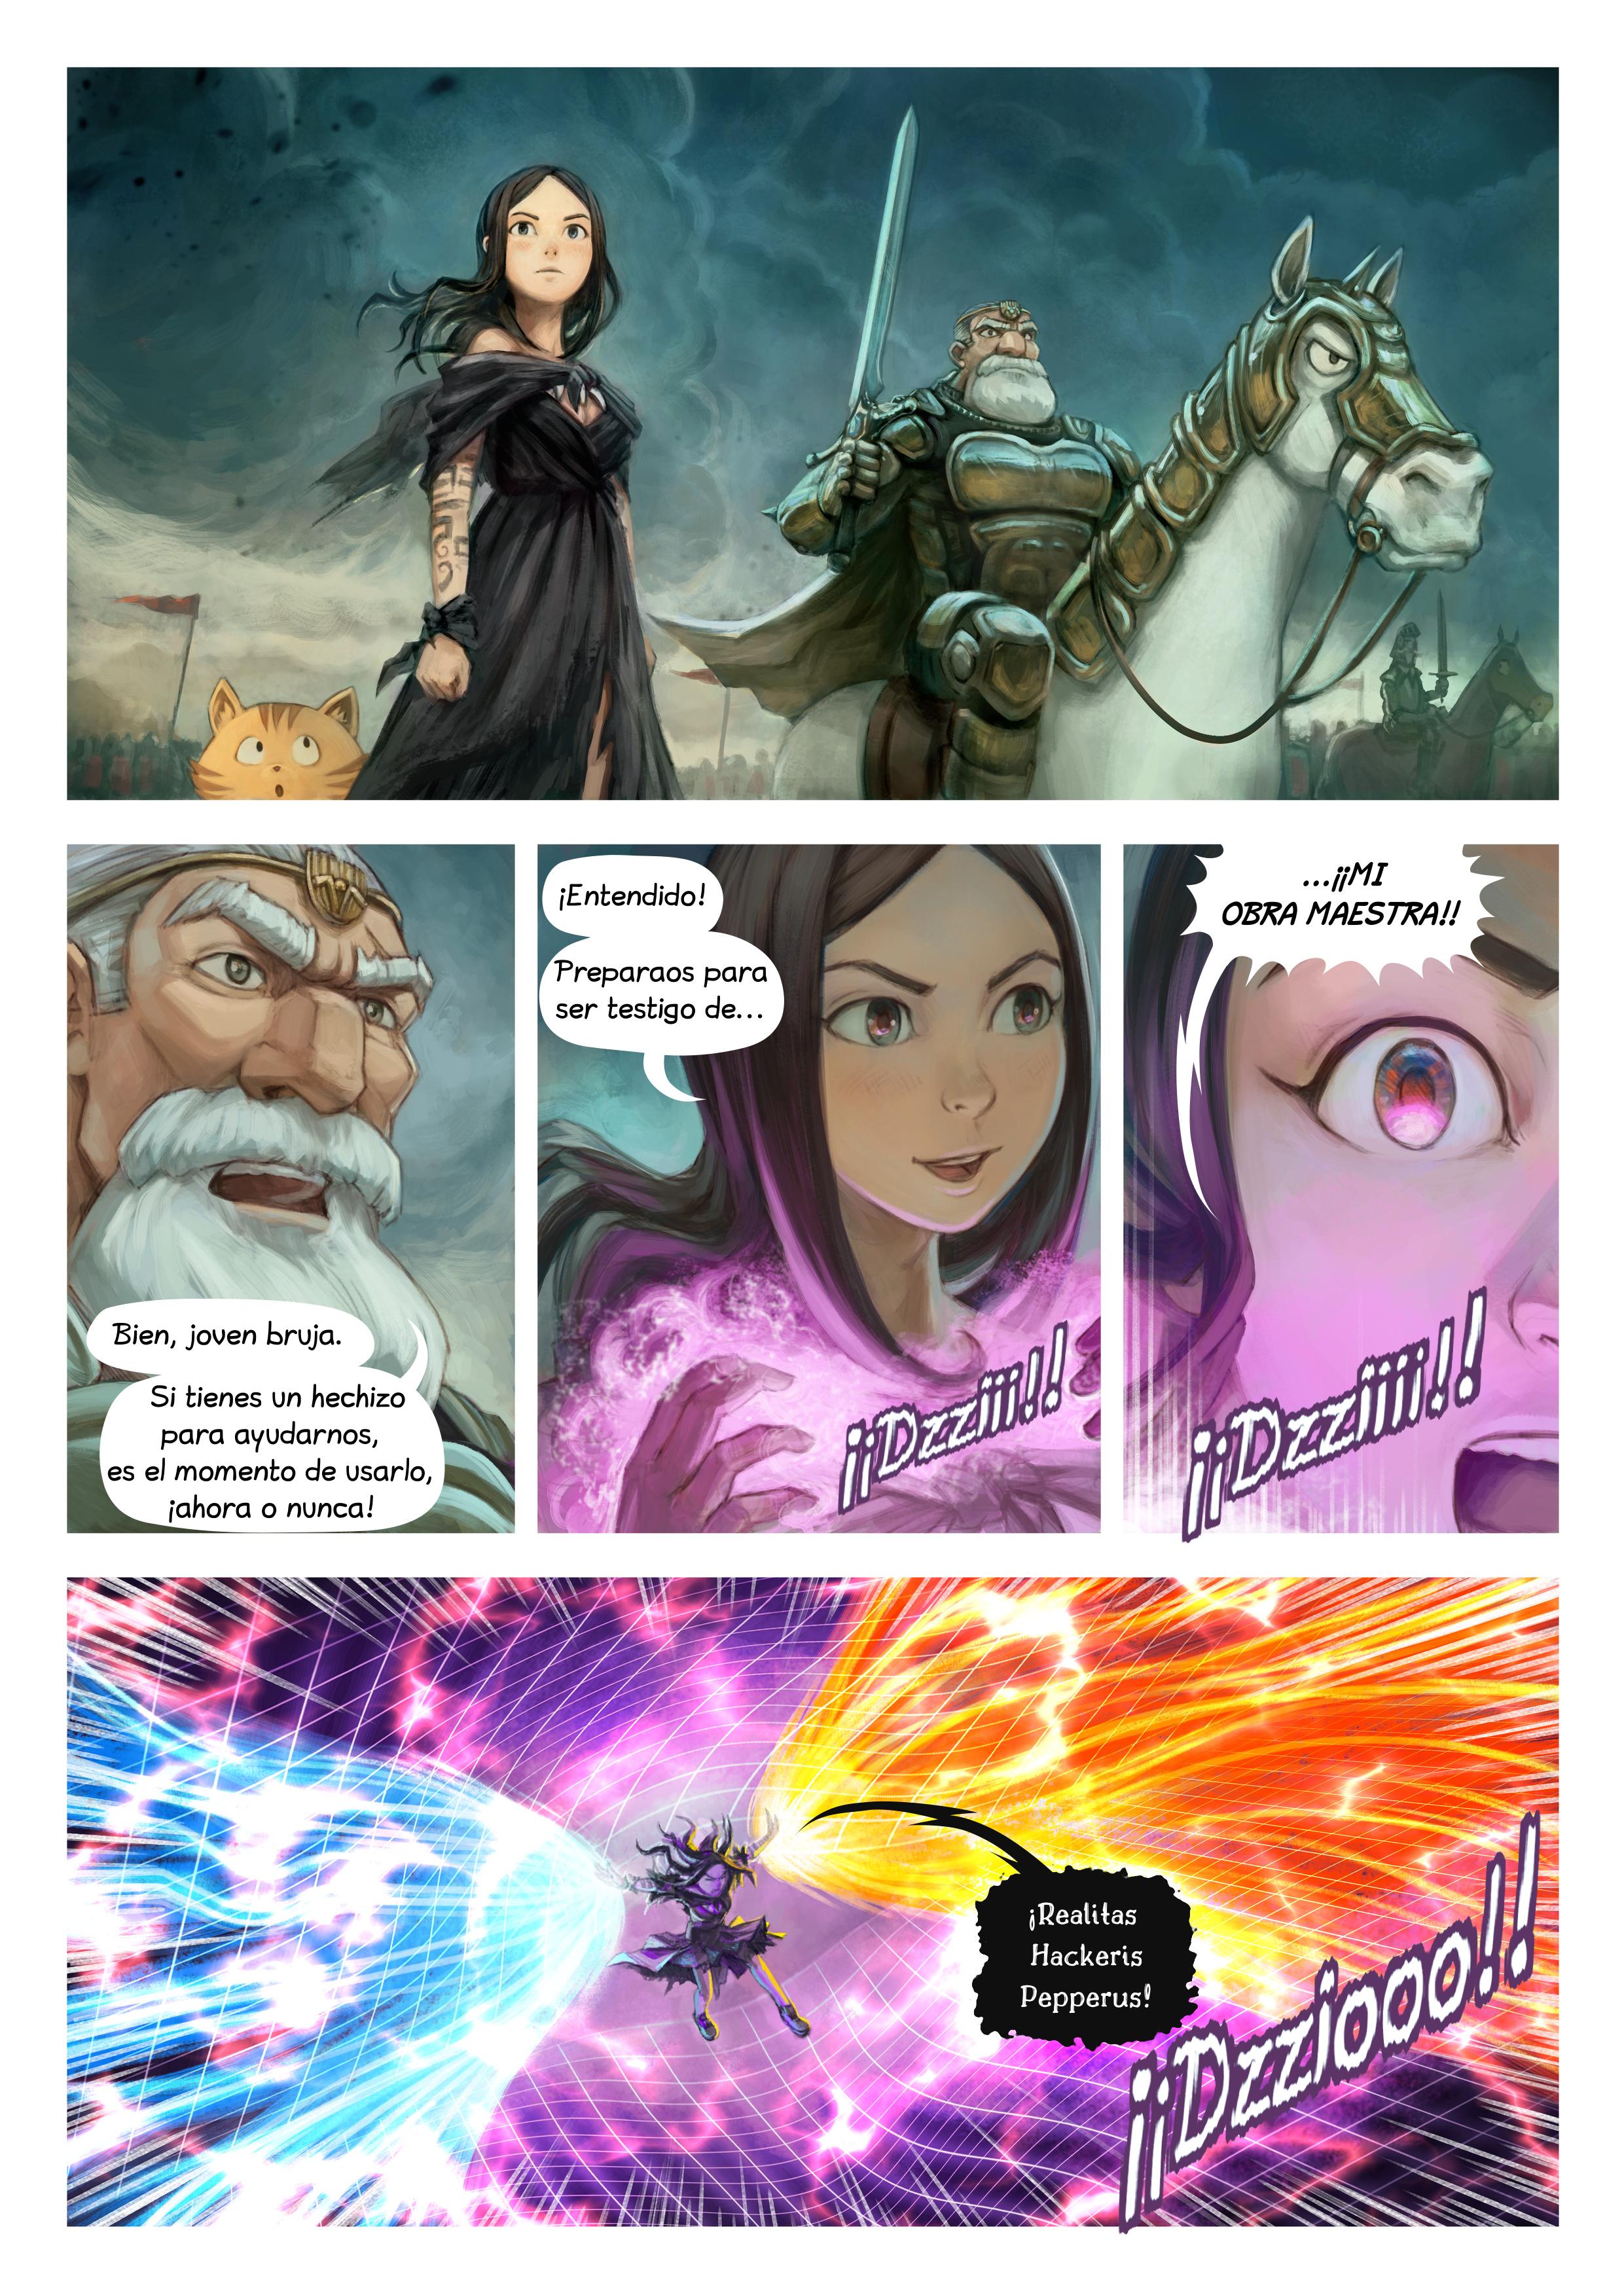 Episodio 33: Hechizo de guerra, Page 2